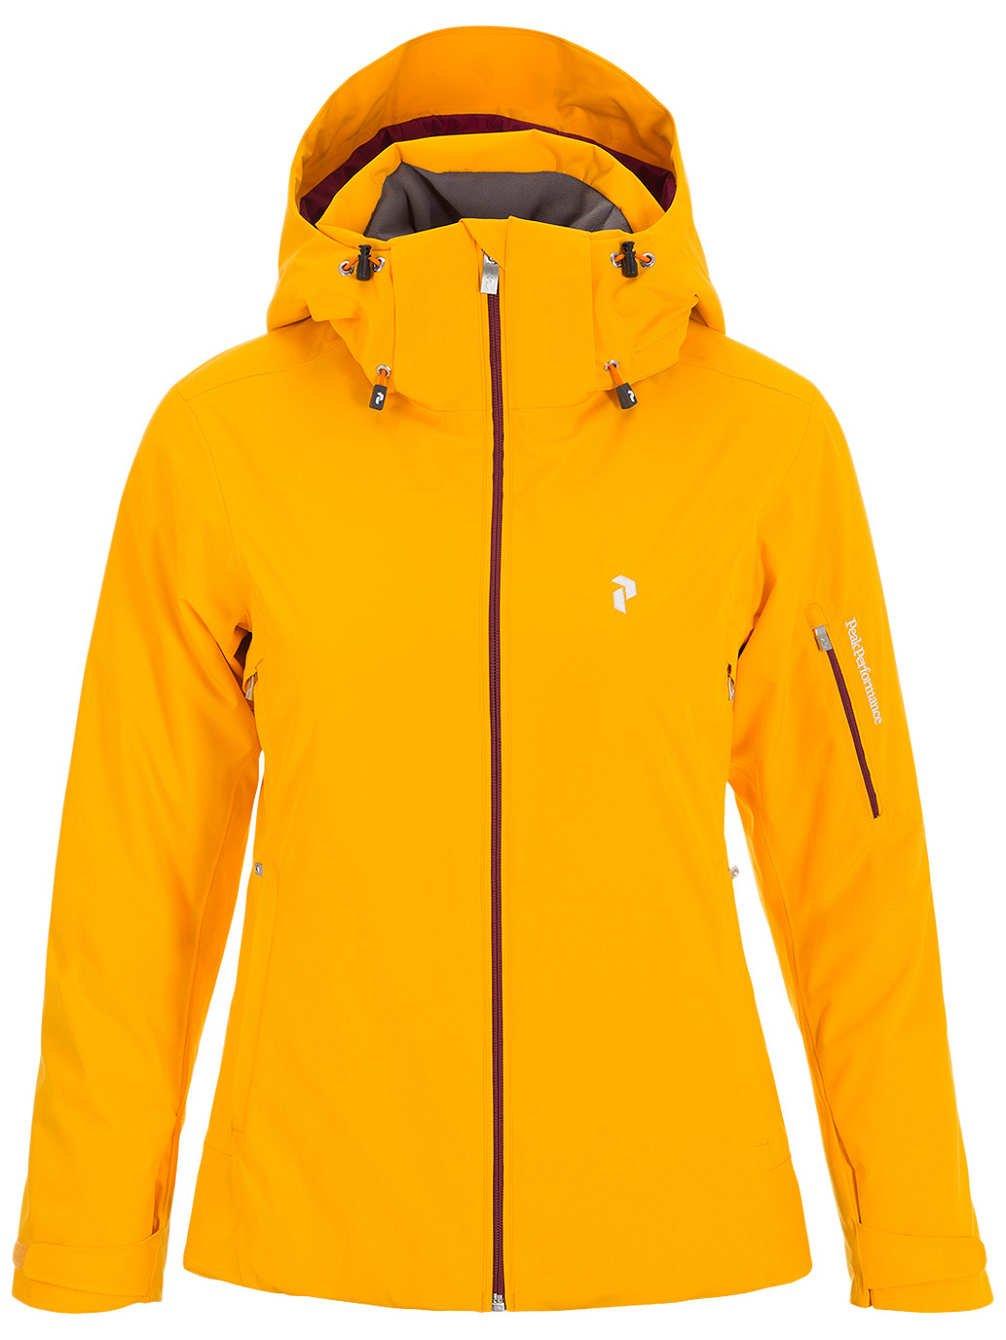 Damen Snowboard Jacke Peak Performance Anima Jacket jetzt kaufen